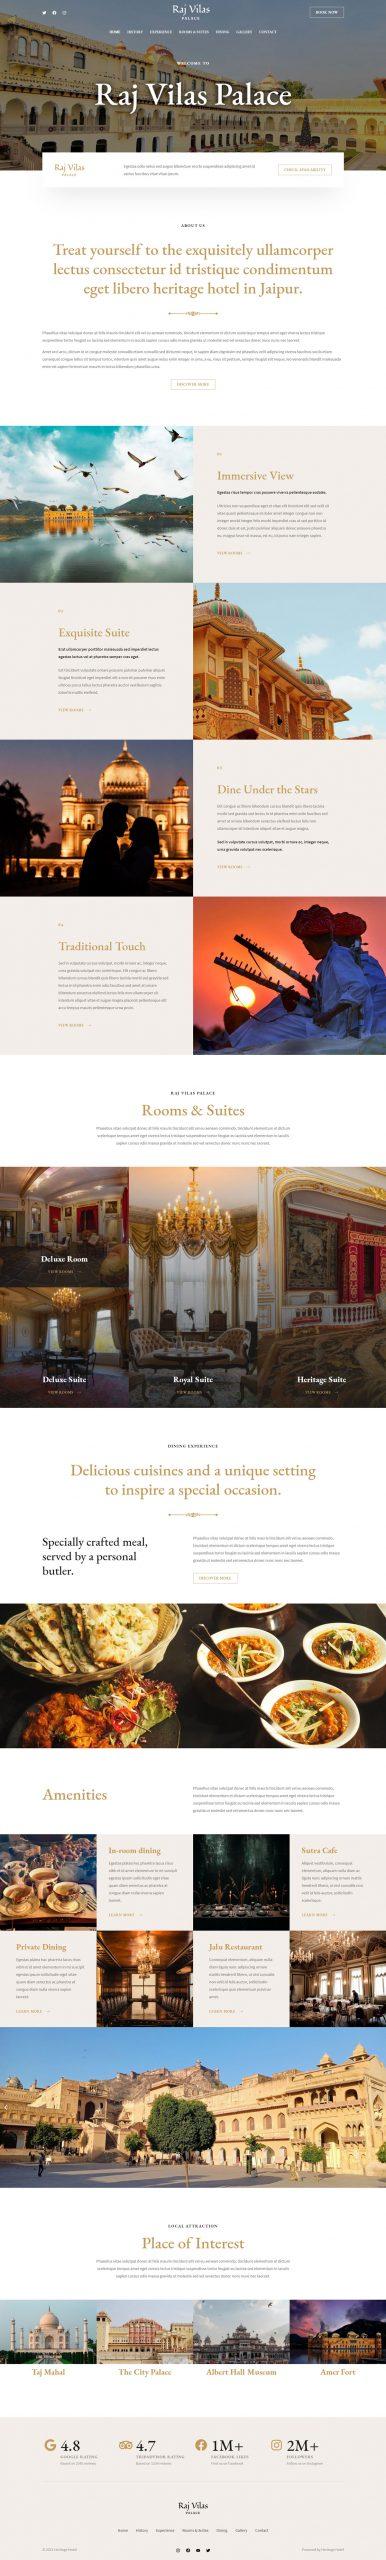 Adamo Web Design | Web Design Durham | heritage hotel 04 home 01 scaled